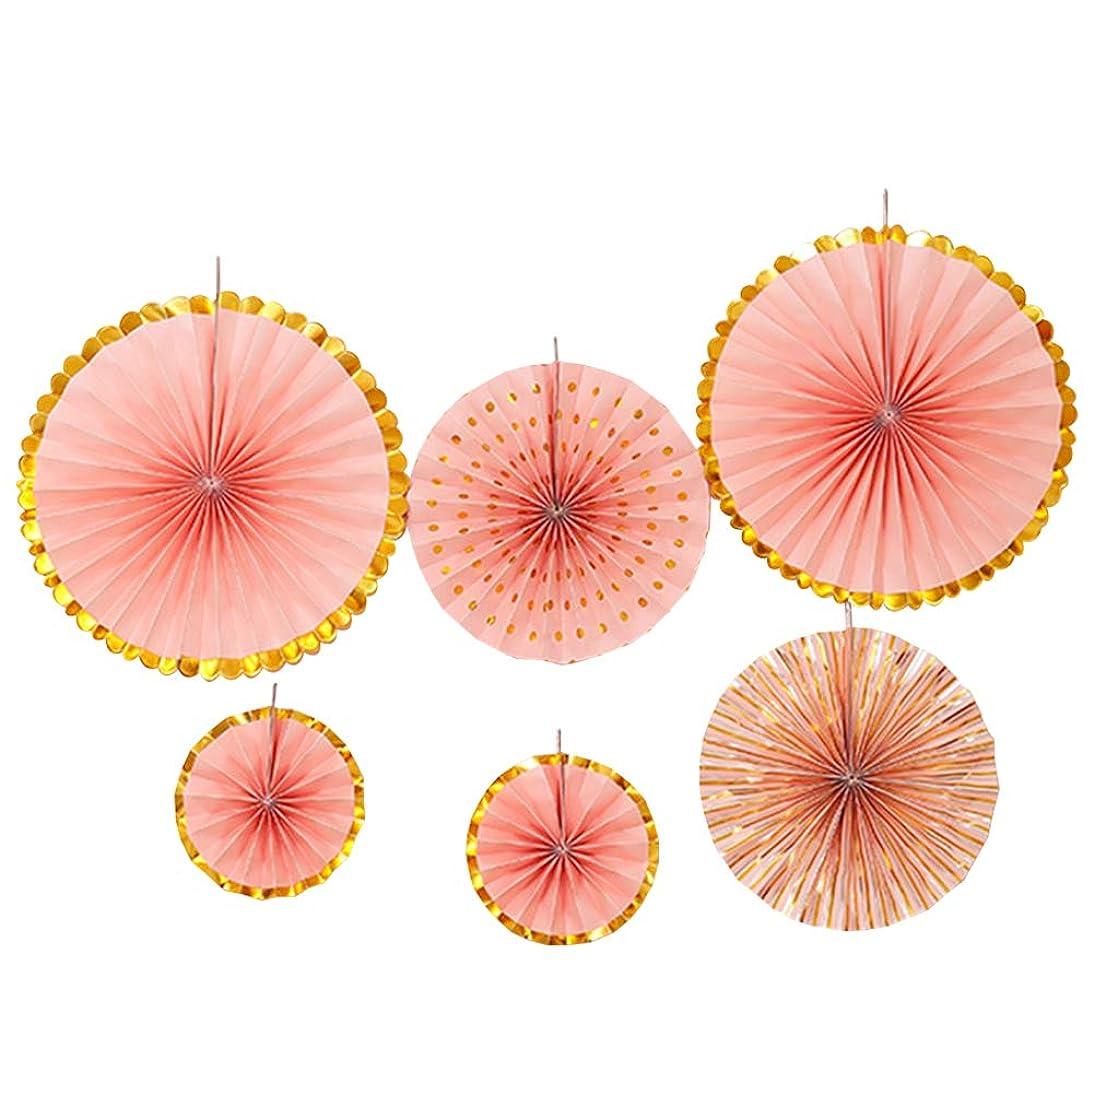 youta Hanging Paper Fans Kit Decor Folding Art Tissue Paper Fans Party Festival Wedding Home Decoration Peach Gold